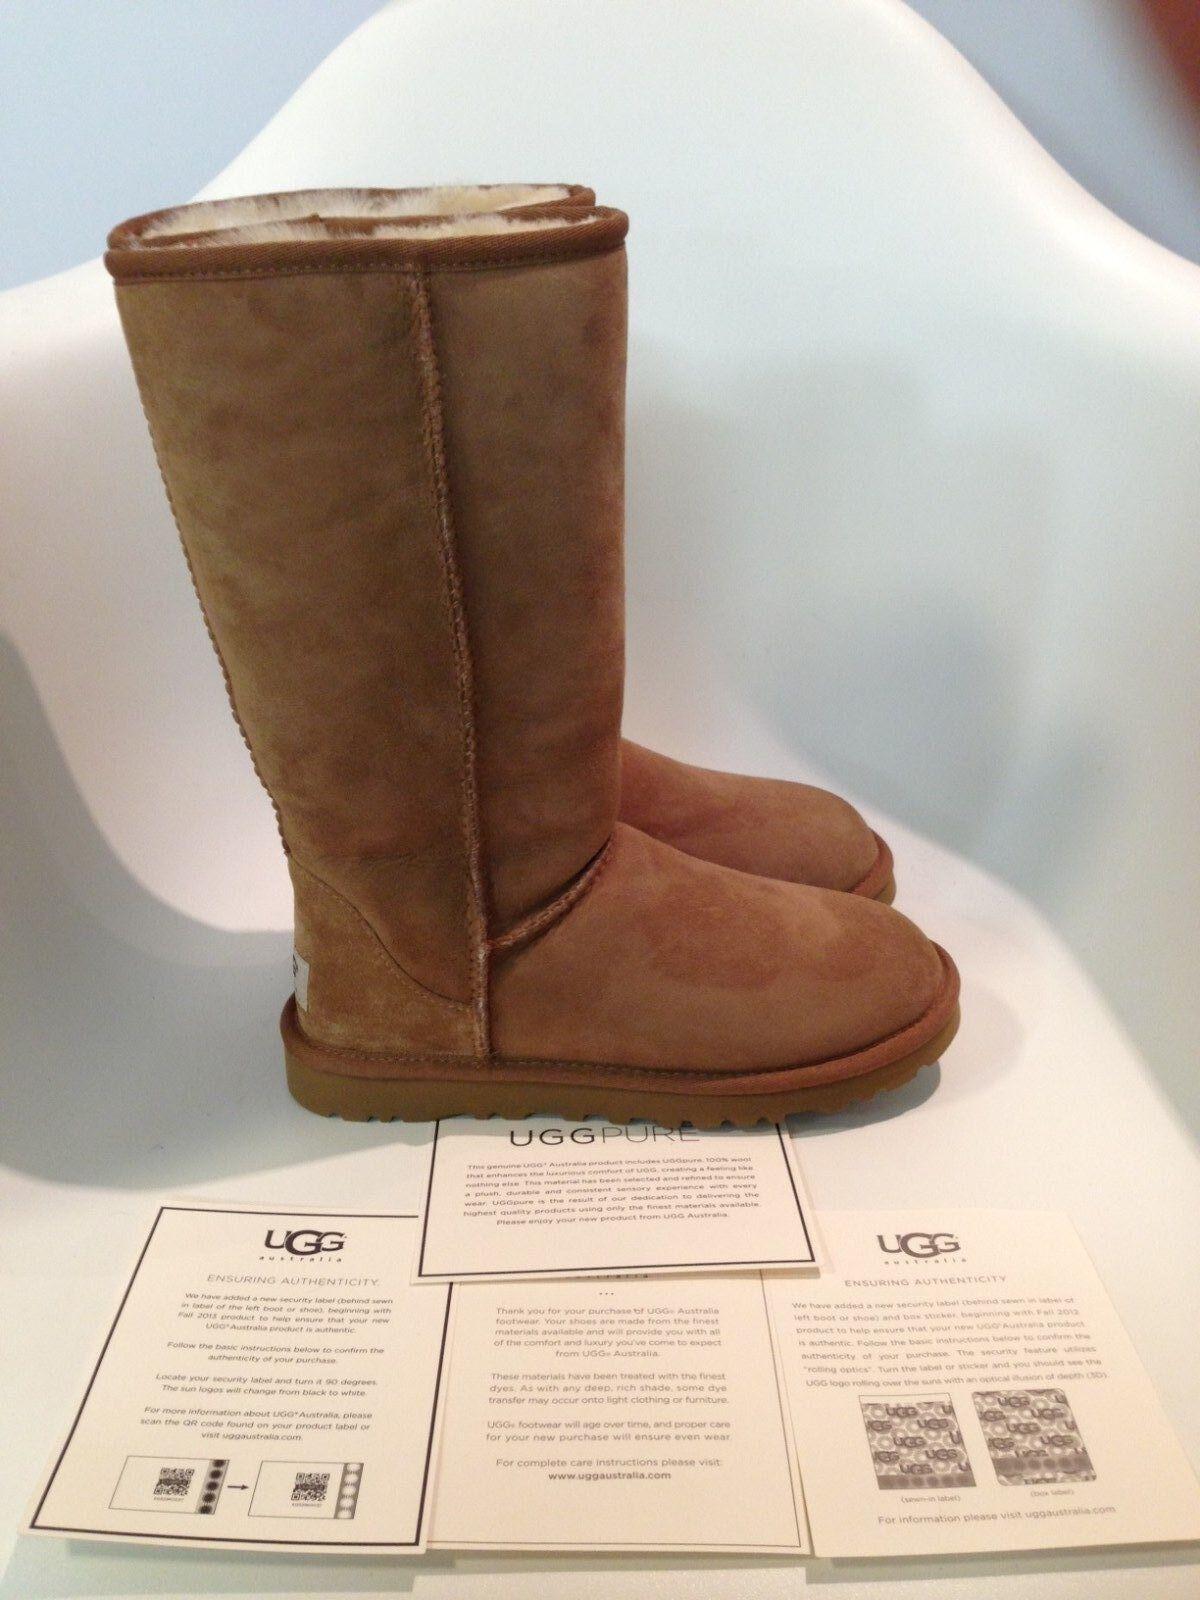 UGG Australia Classic Tall II Chestnut Boot Damengröße 5-11 / 36-42 NEU